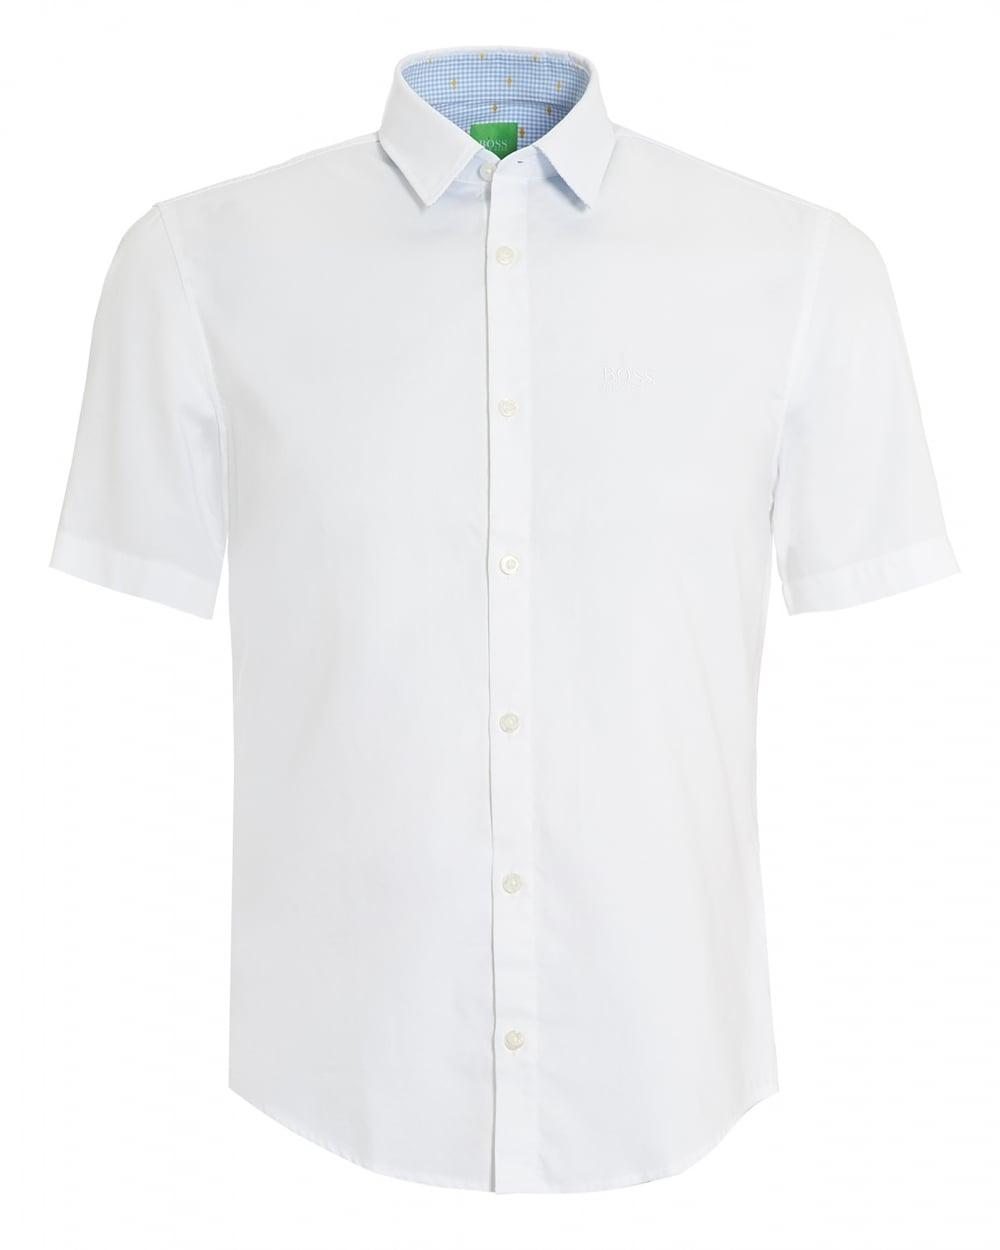 cec352a5f7d0 Hugo Boss Green Mens C-Busterino Plain White Short Sleeve Shirt